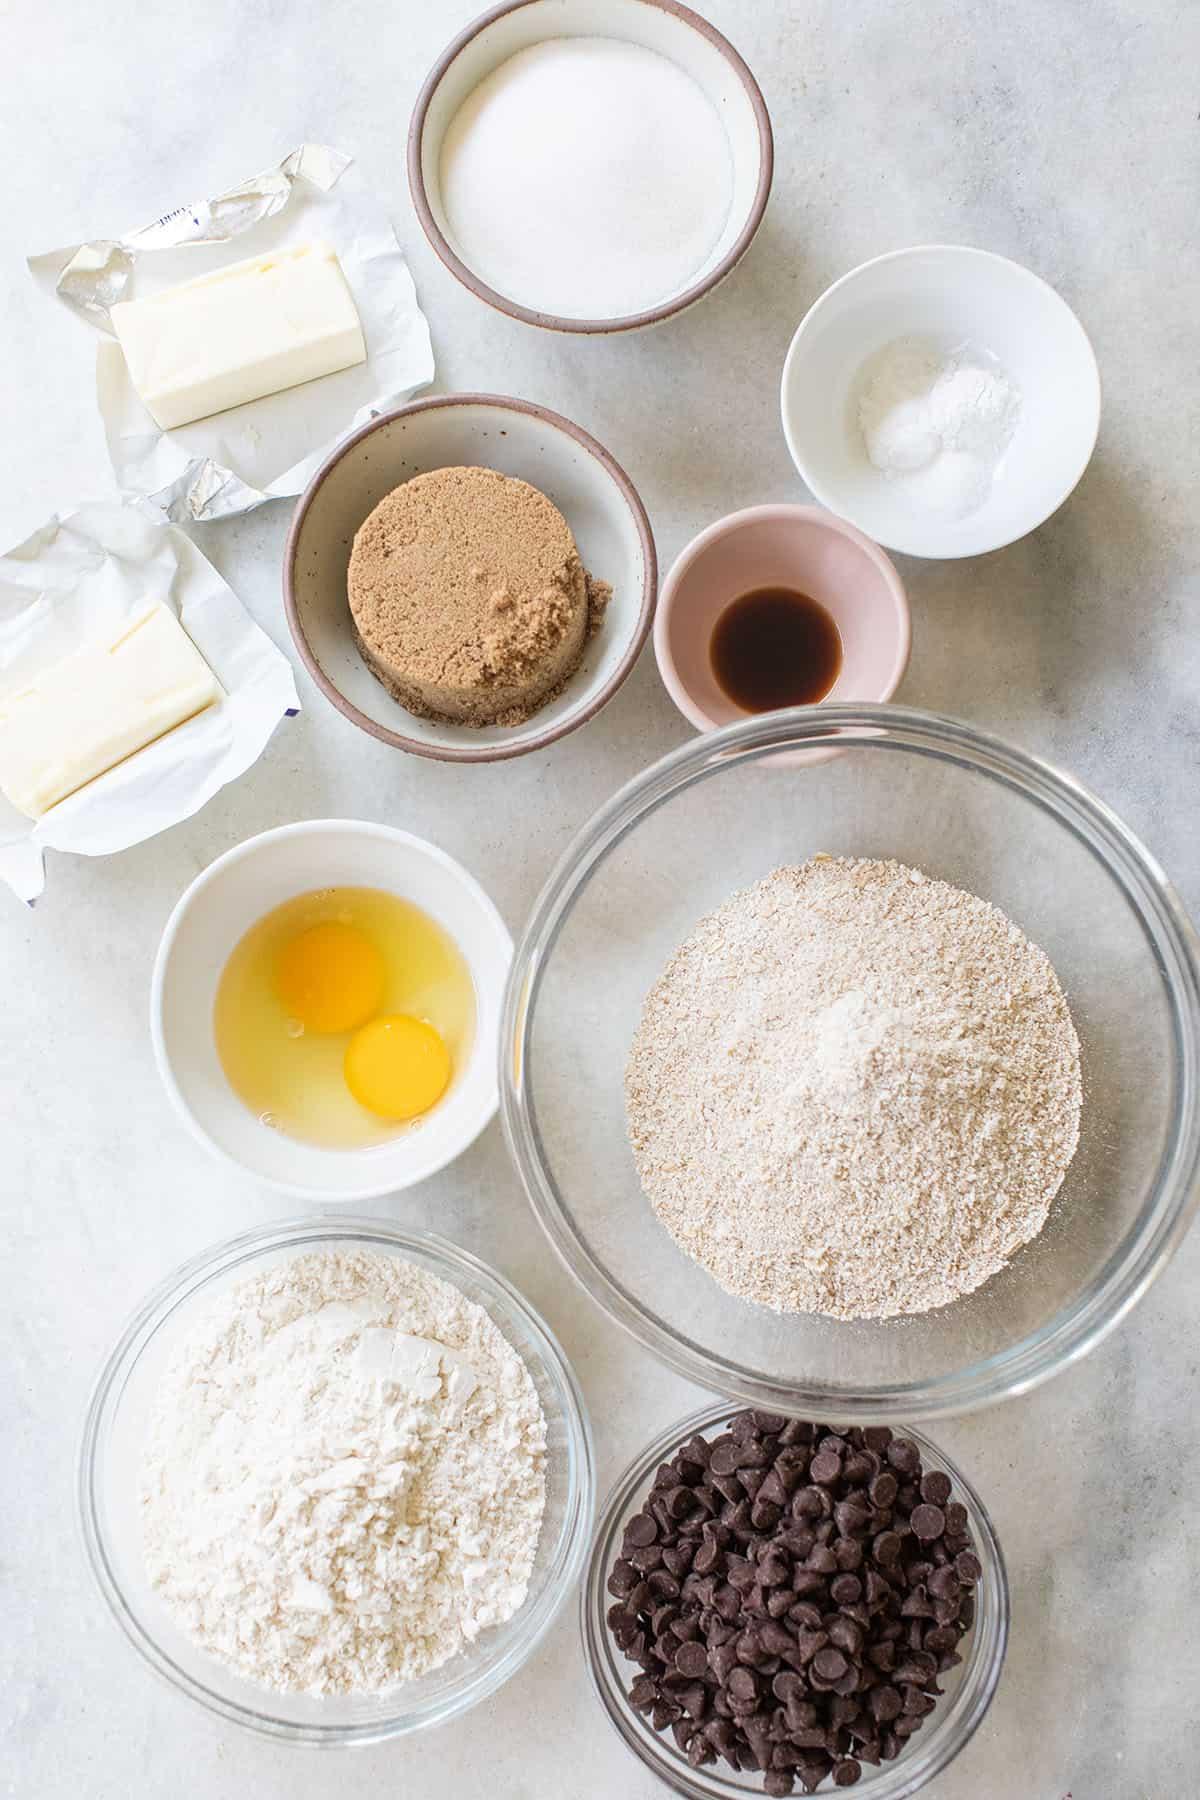 butter, sugar, brown sugar, eggs, oats, flour, vanilla extract, baking soda and powder in bowls.